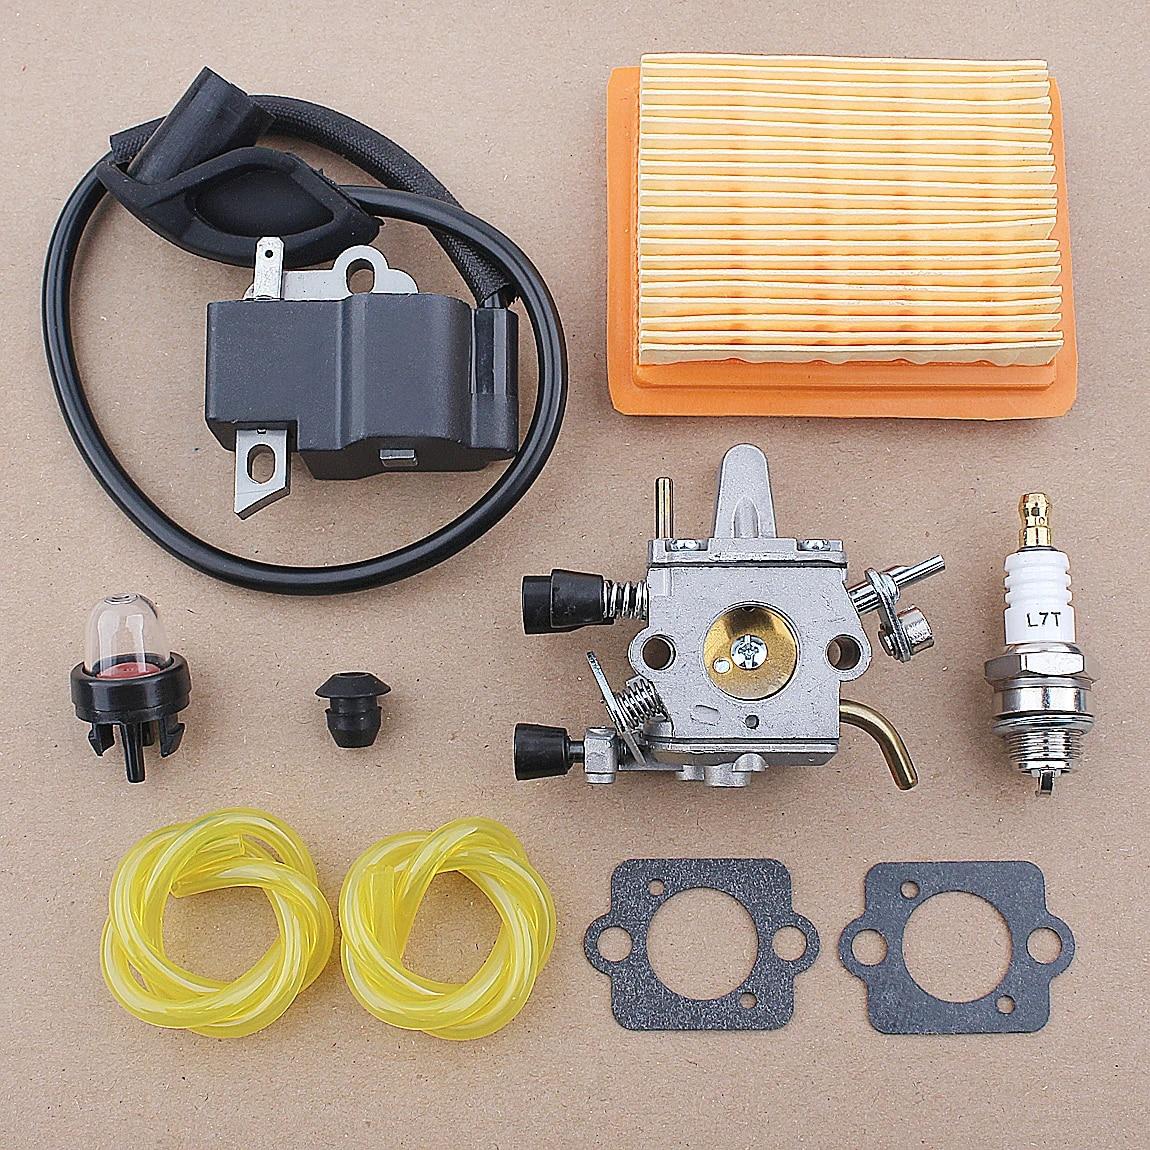 Carburetor Ignition Coil Air Filter For STIHL FS120.FS200.FS250.FS250R Chainsaw